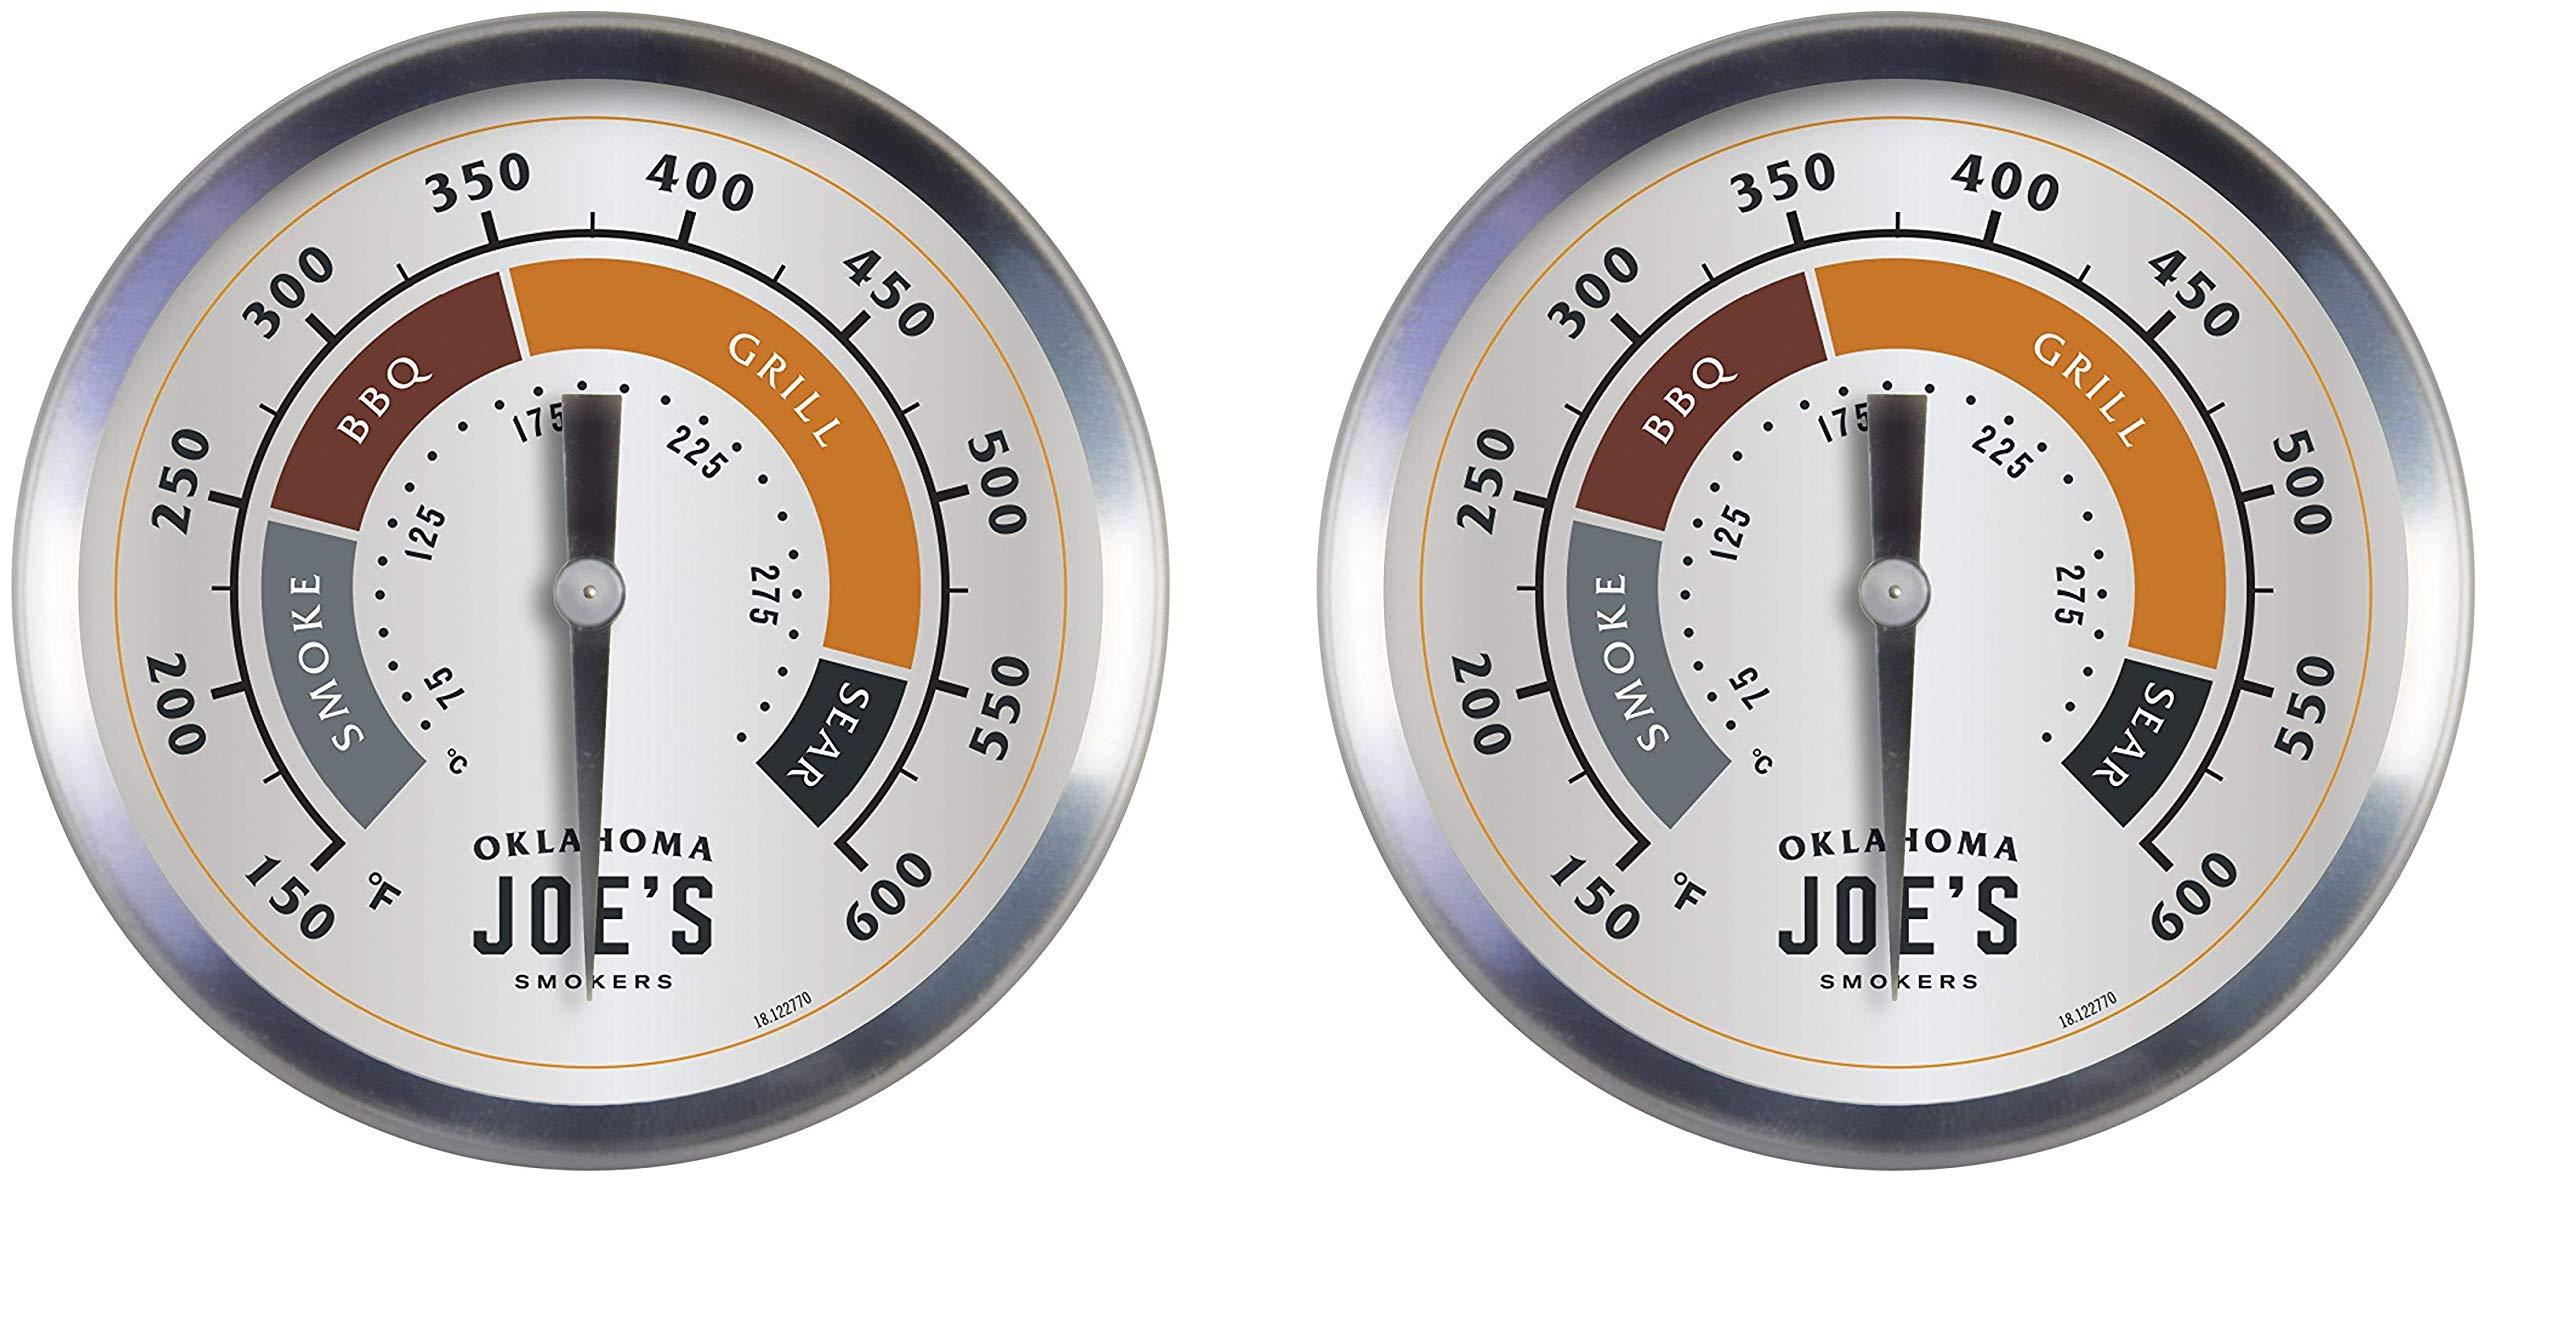 Oklahoma Joe's 3595528R06 Temperature Gauge (2-Pack)